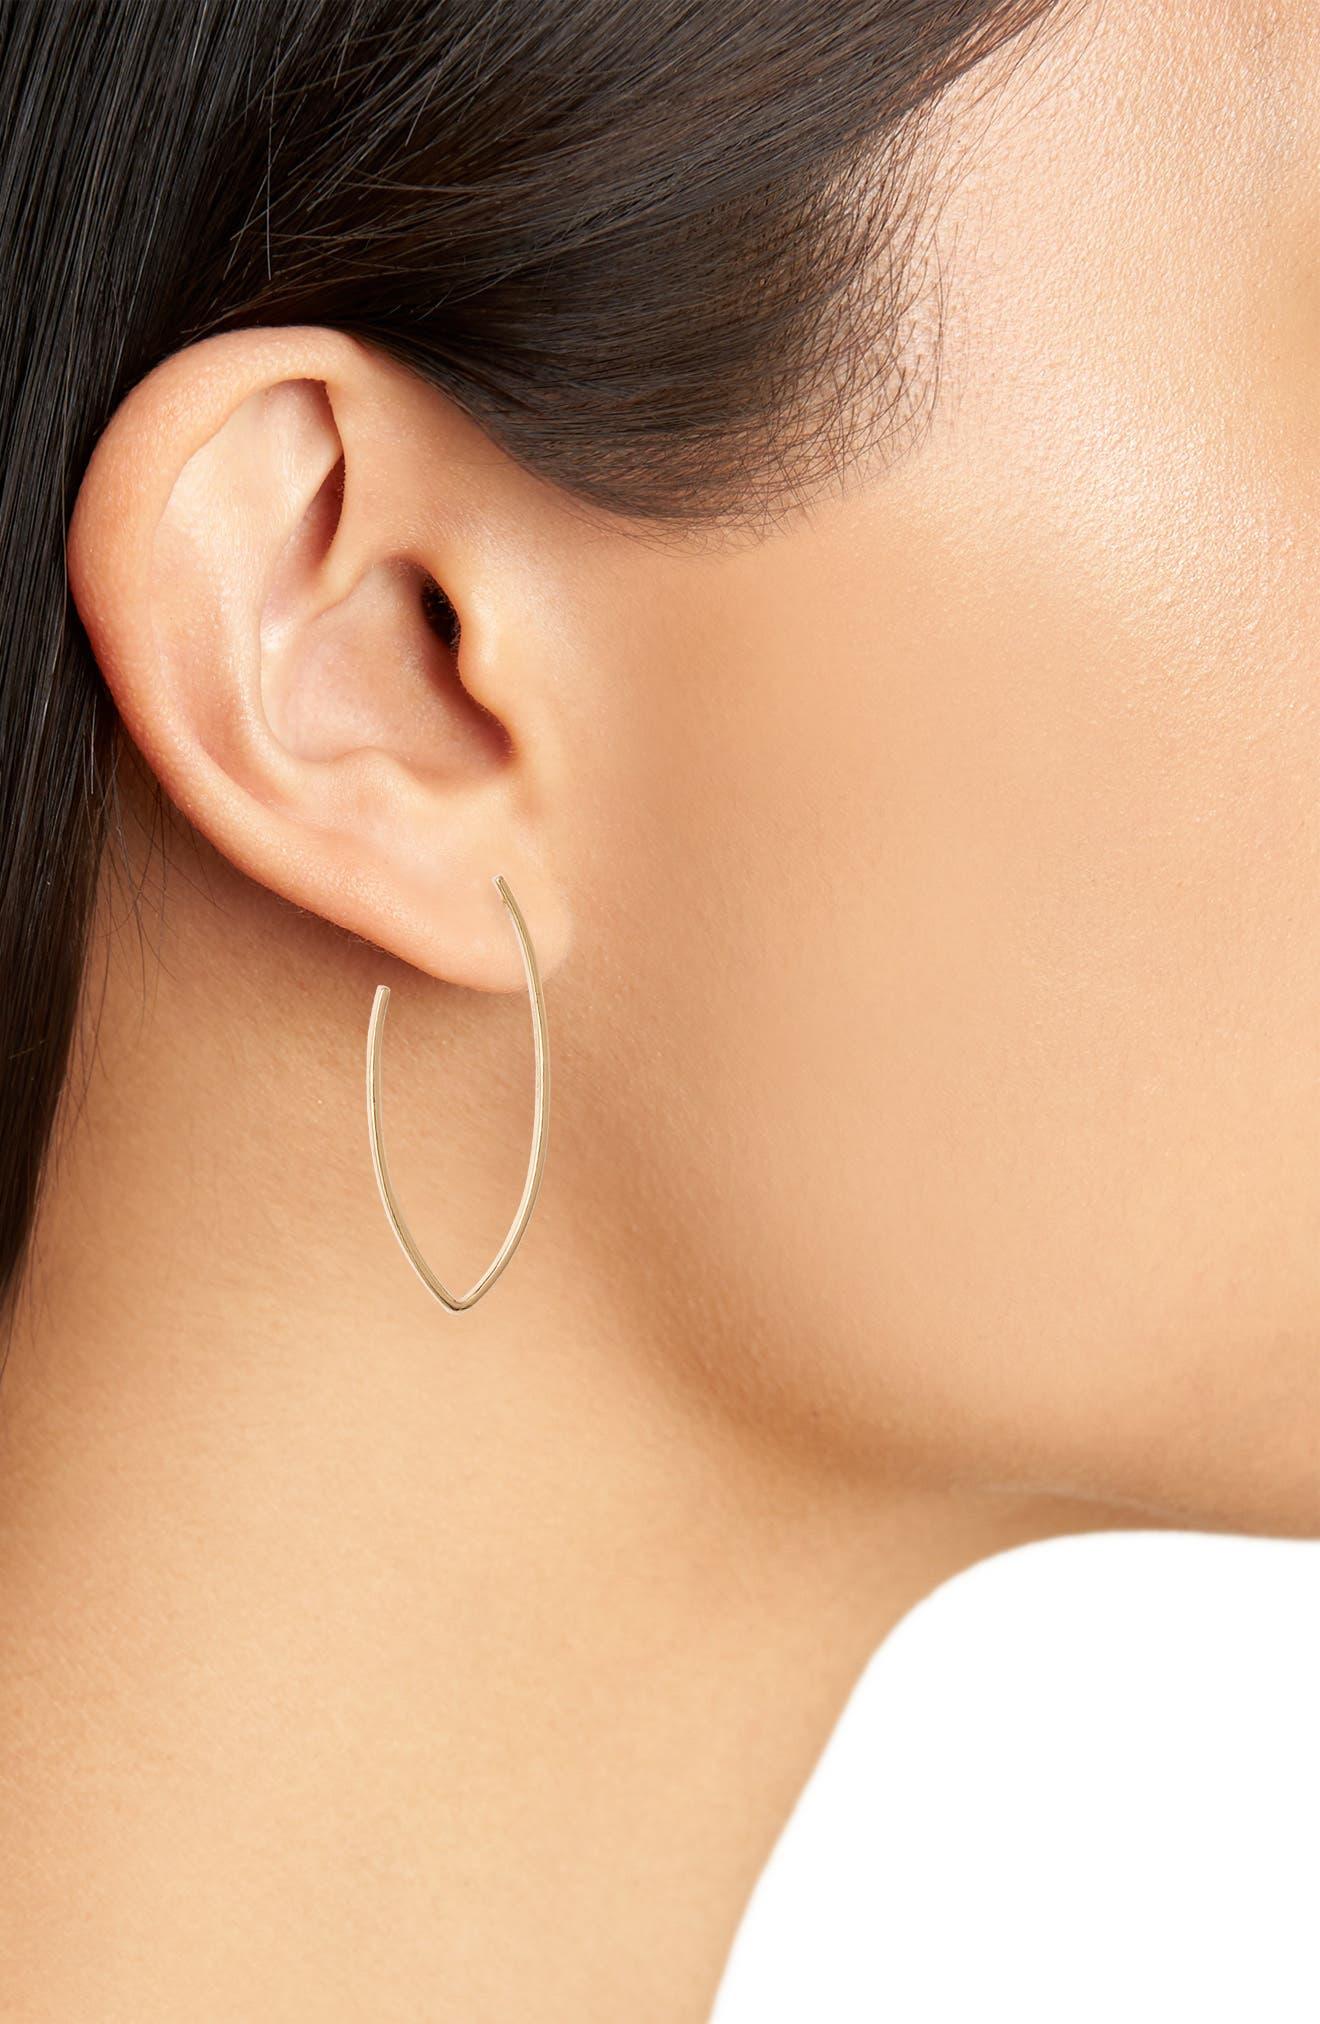 Gold Drop Earrings,                             Alternate thumbnail 2, color,                             710